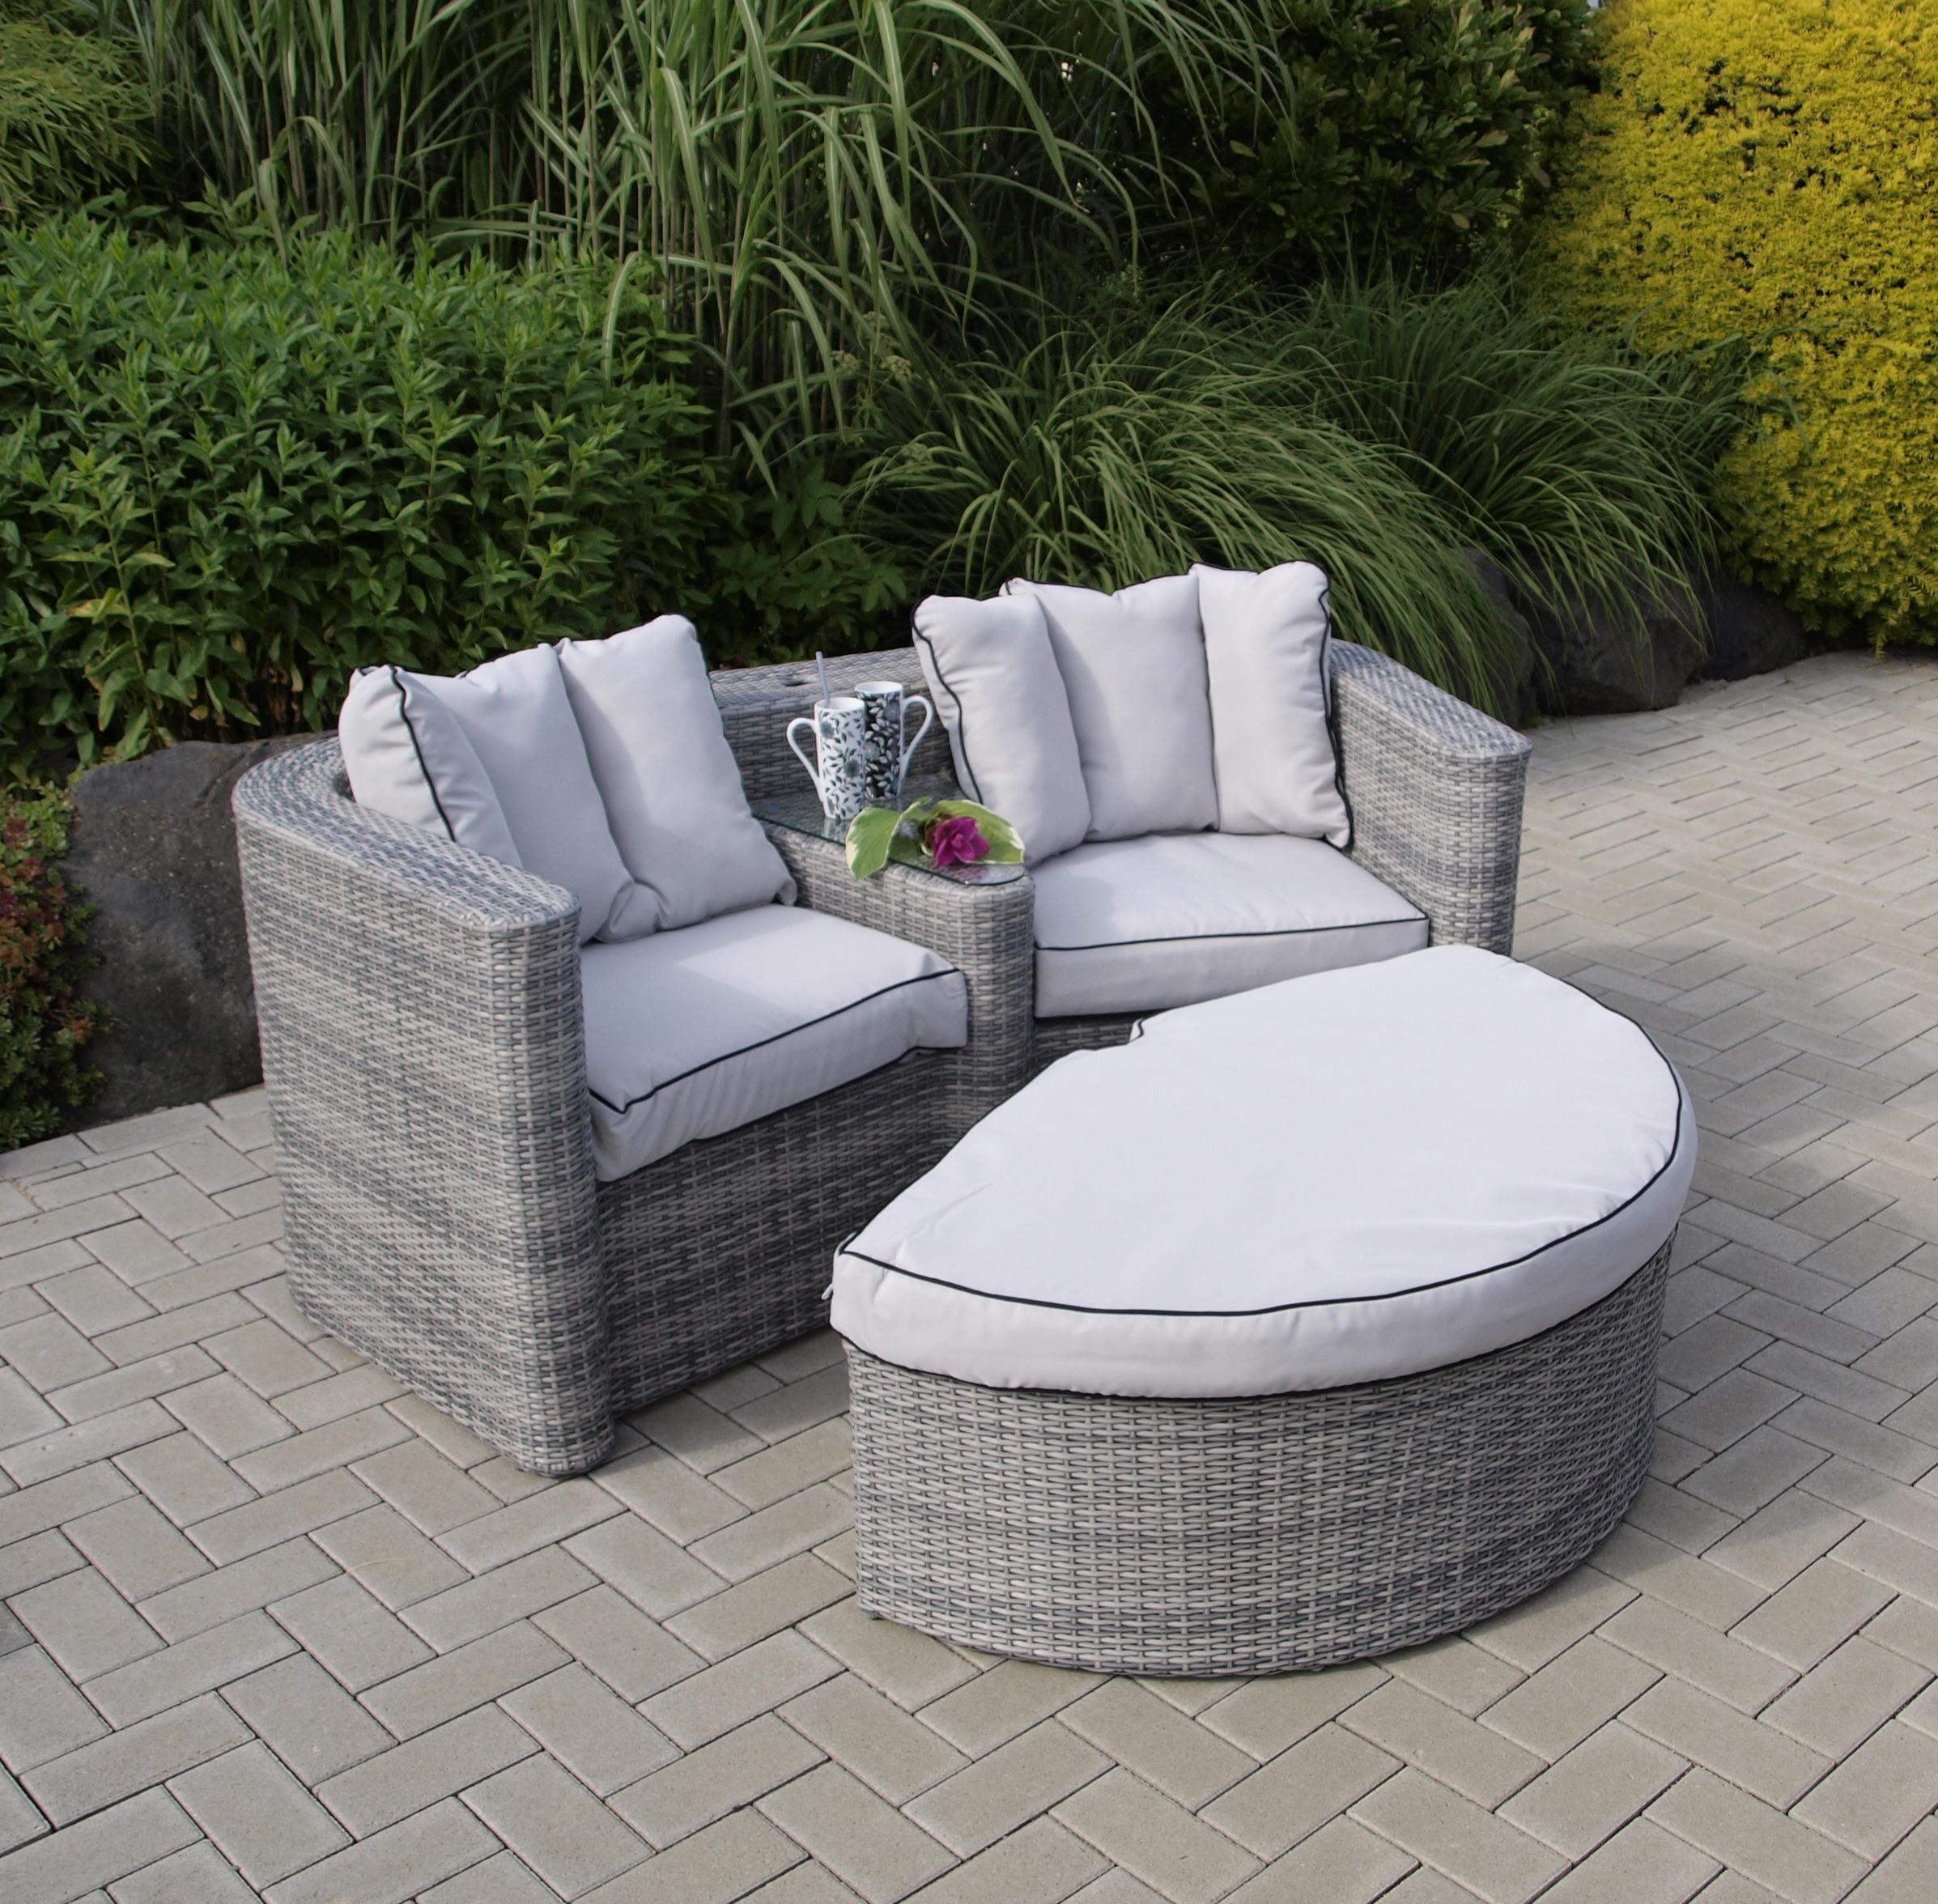 loveseat love seat san lorenzo mit fussteil alu polyrattan grau mit polstern ebay. Black Bedroom Furniture Sets. Home Design Ideas